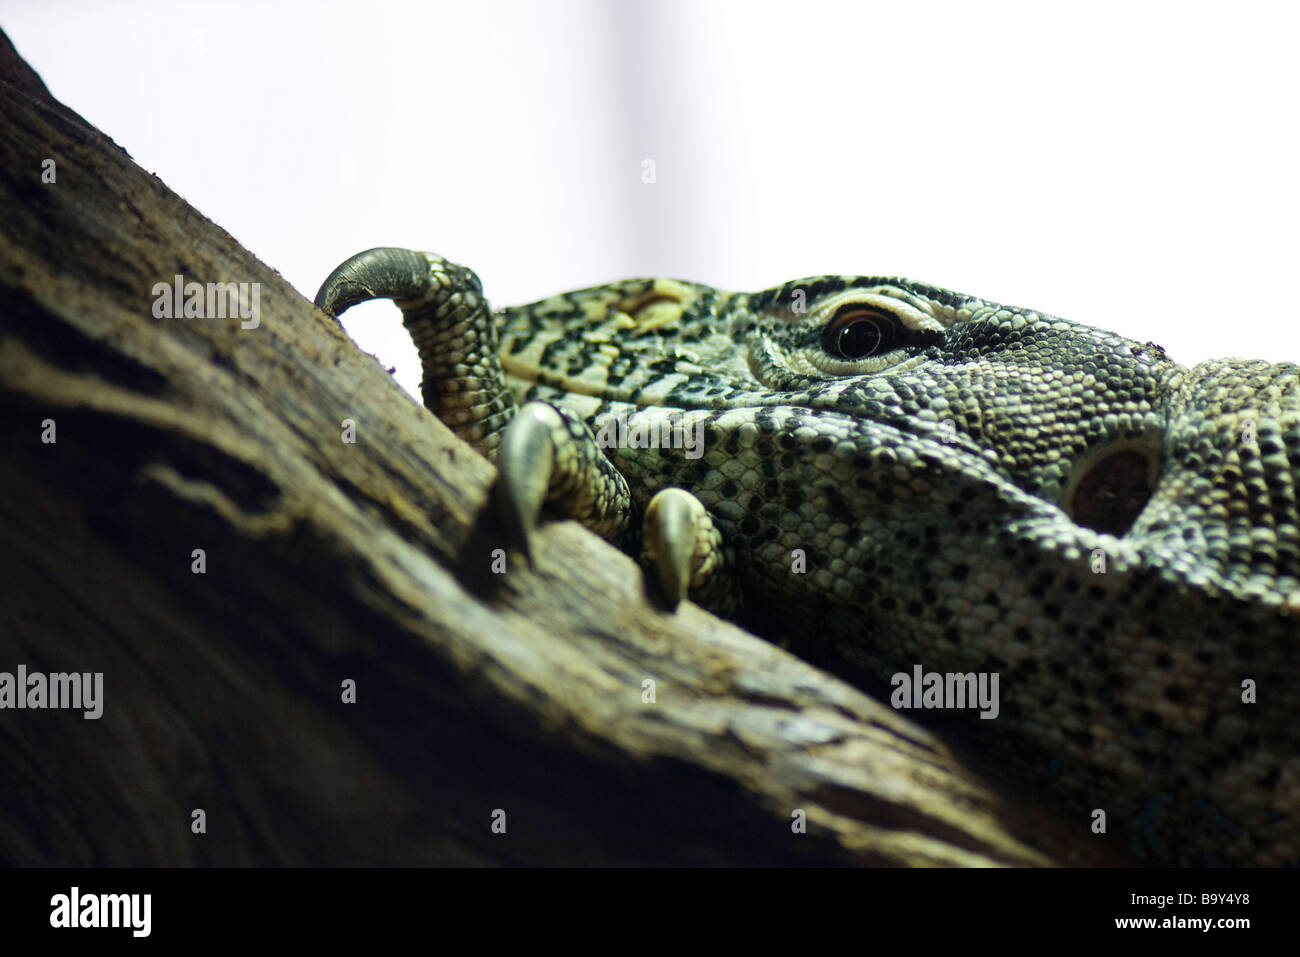 Nilwaran (Varanus Niloticus) Stockbild